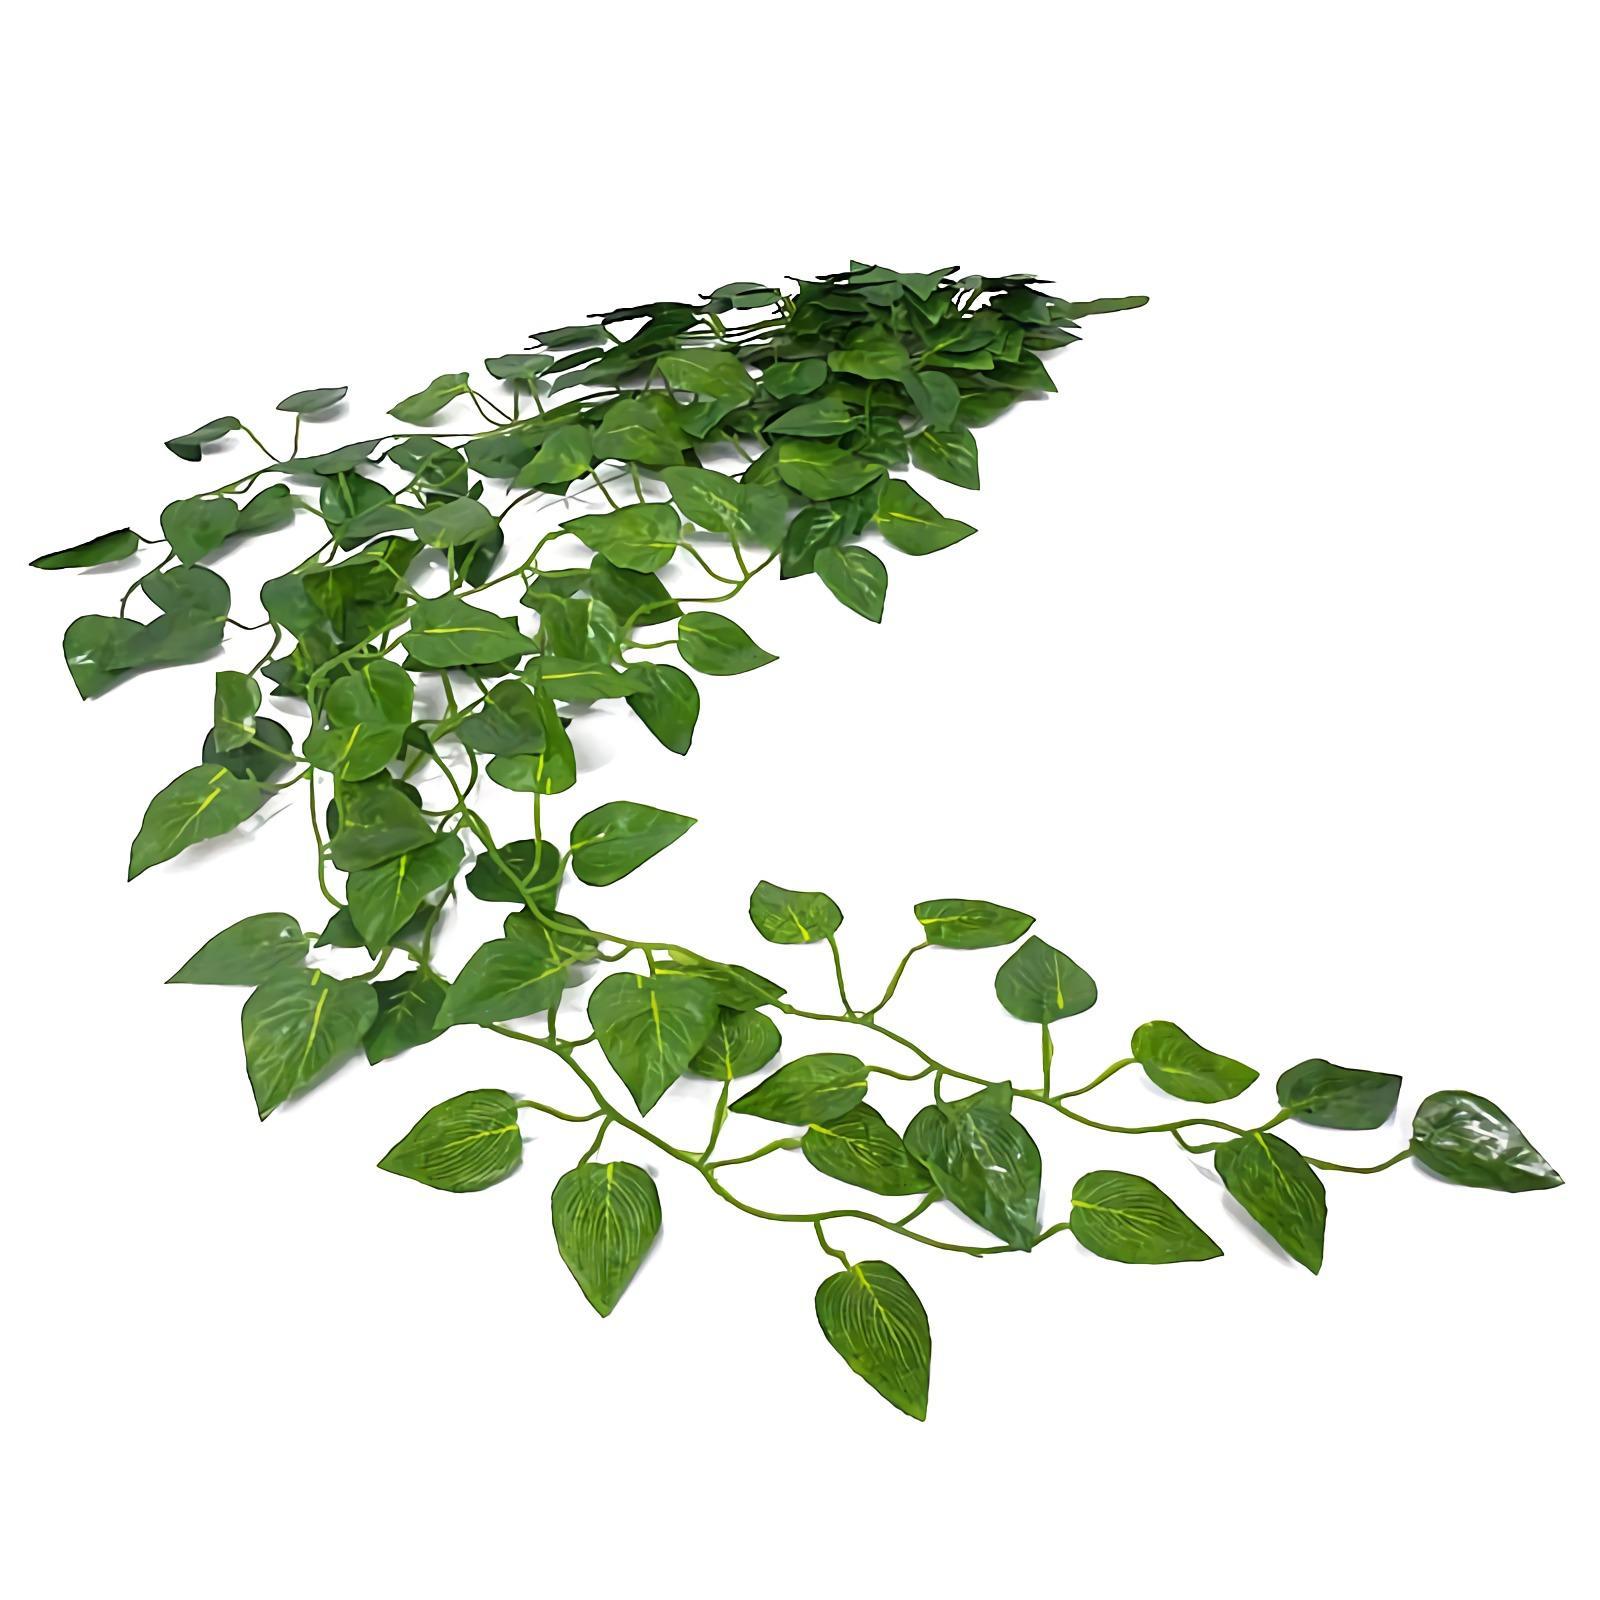 ... Vas Huruf Alfabet Welcome Dekorasi Rumah - Hijau. Source · OHOME Daun  Juntai Artifisial Artificial Leaf Dekorasi Interior AN-B000403I Hijau c7e6a9dd75